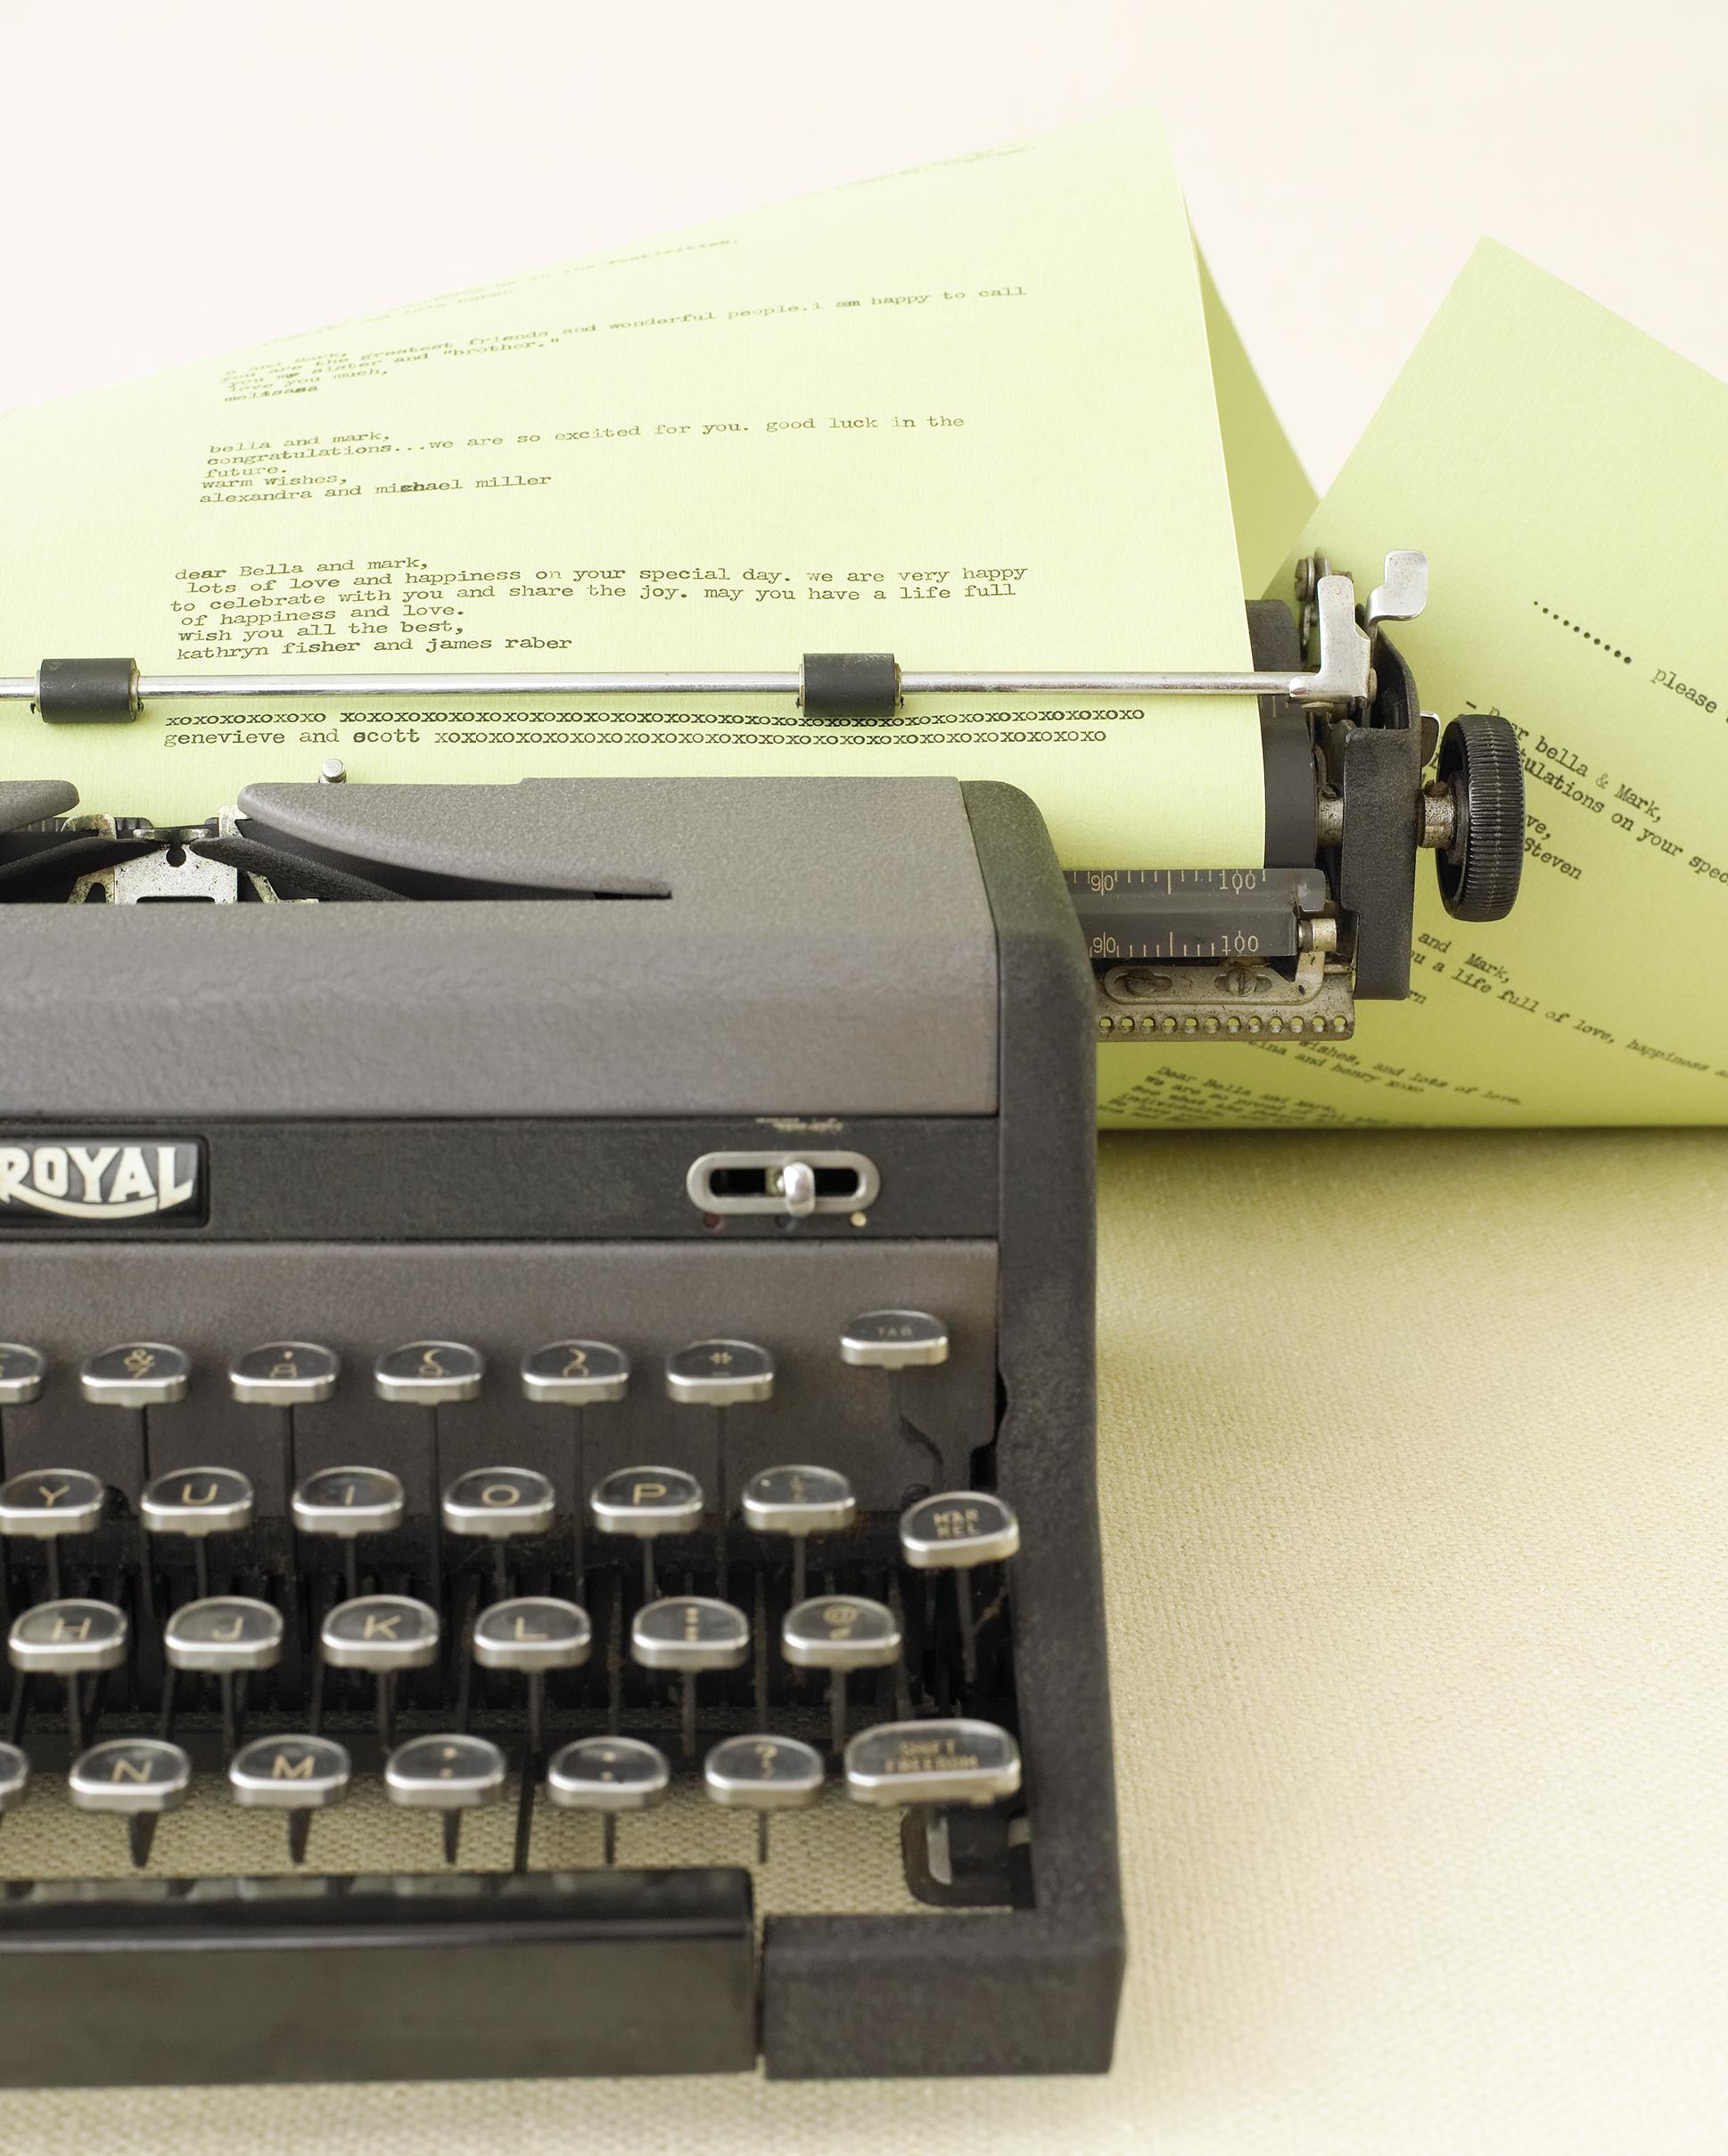 diyguest-typewriter-0715.jpg